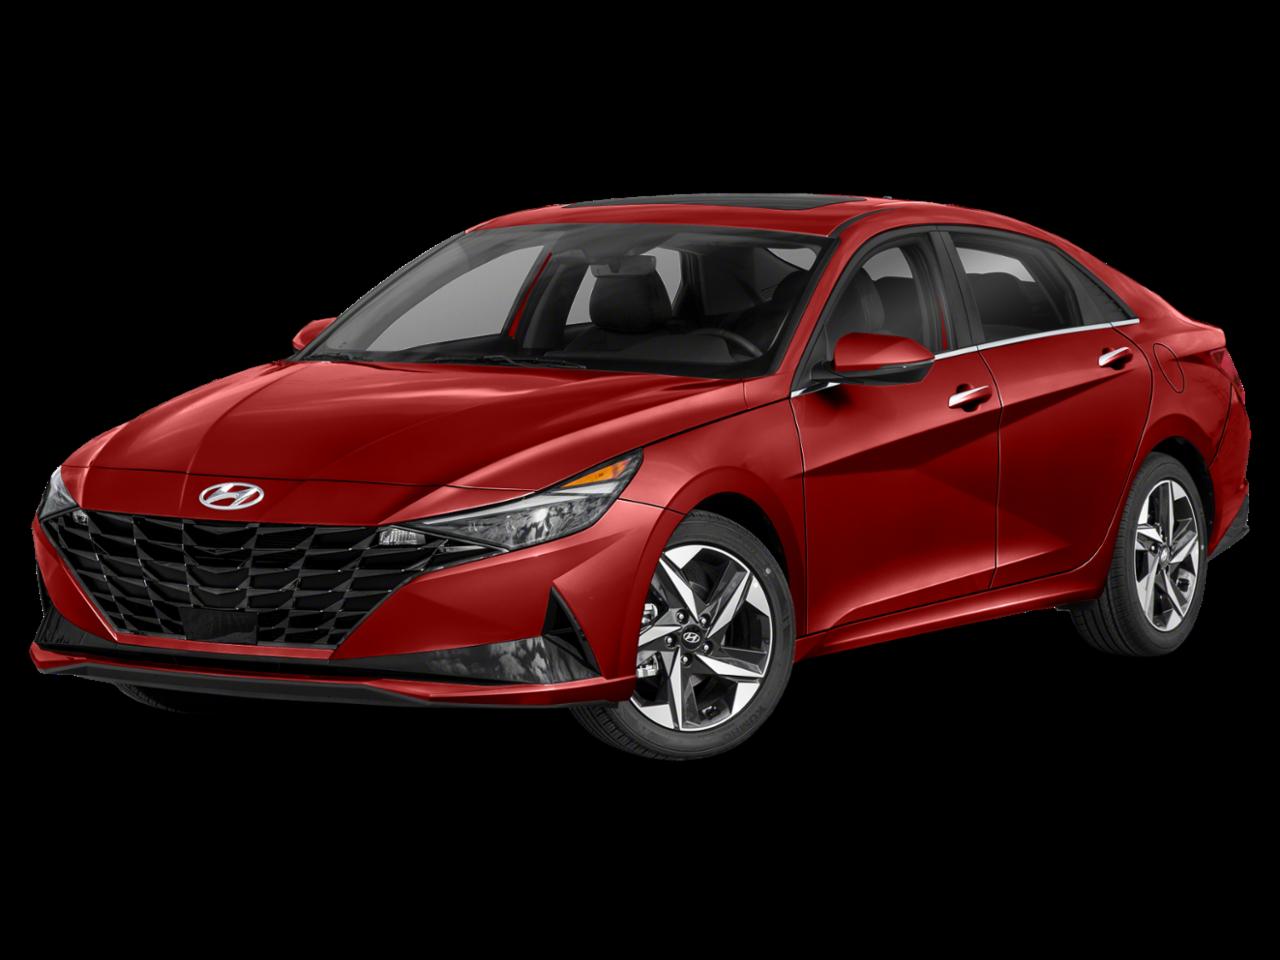 Hyundai 2021 Elantra Limited